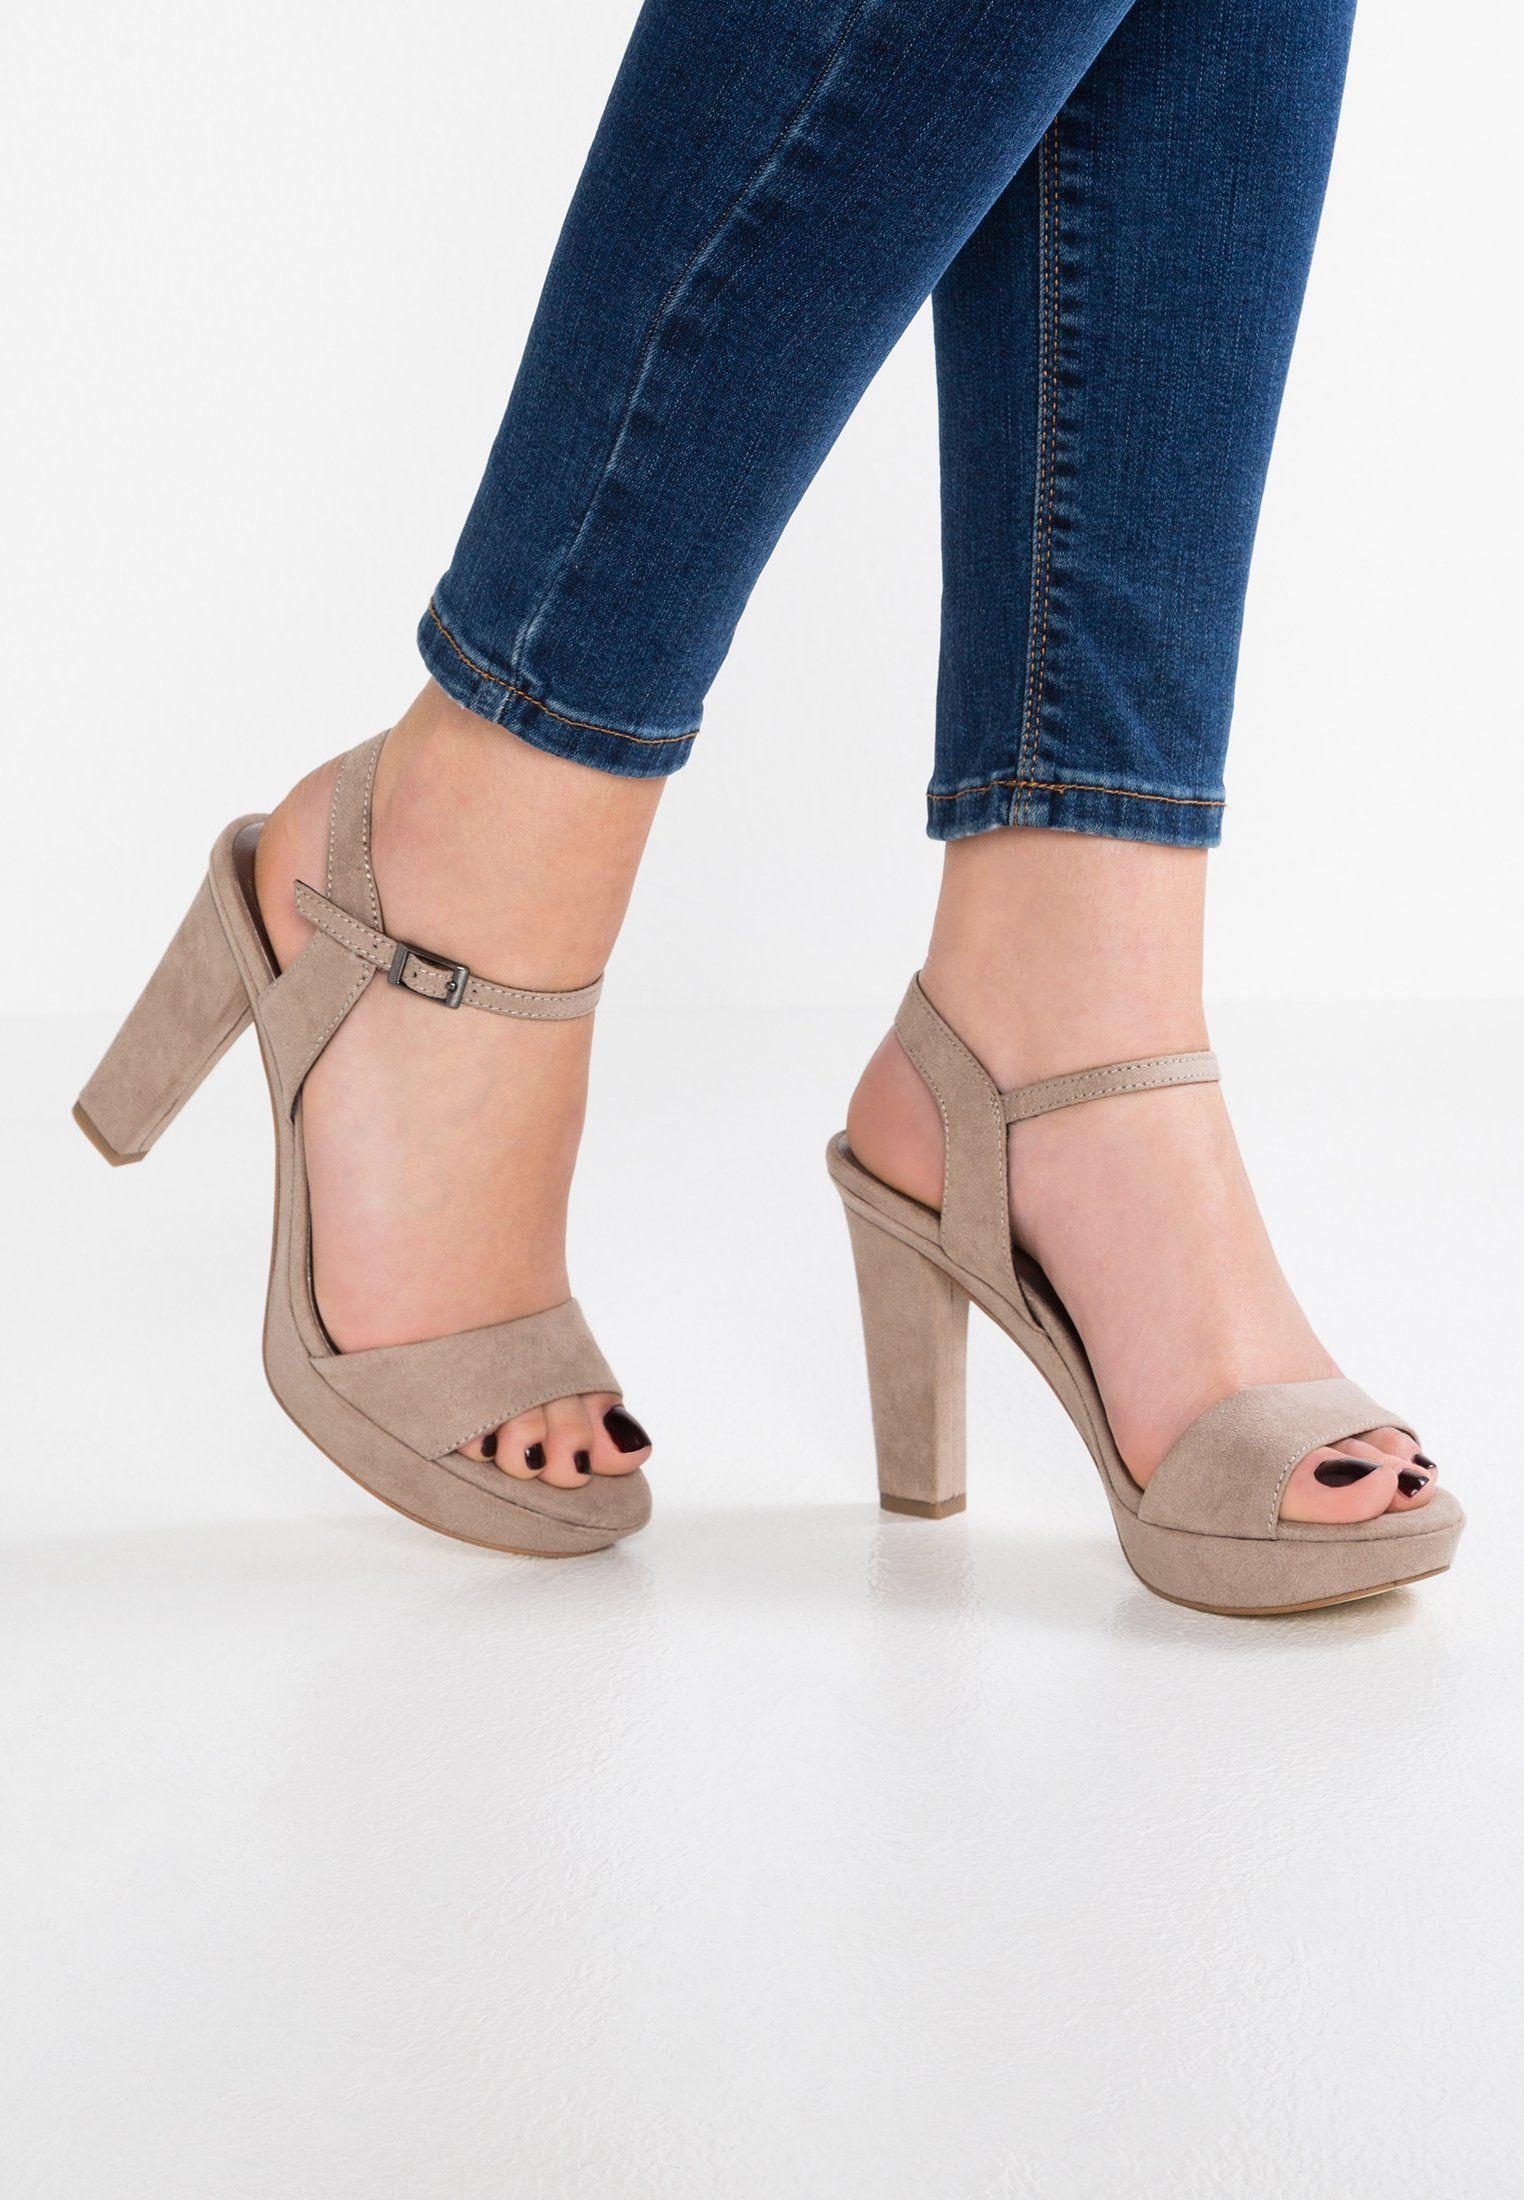 Tamaris High Heeled Sandals Pepper Zalando Co Uk Casual Shoes Sandals Heels Heels